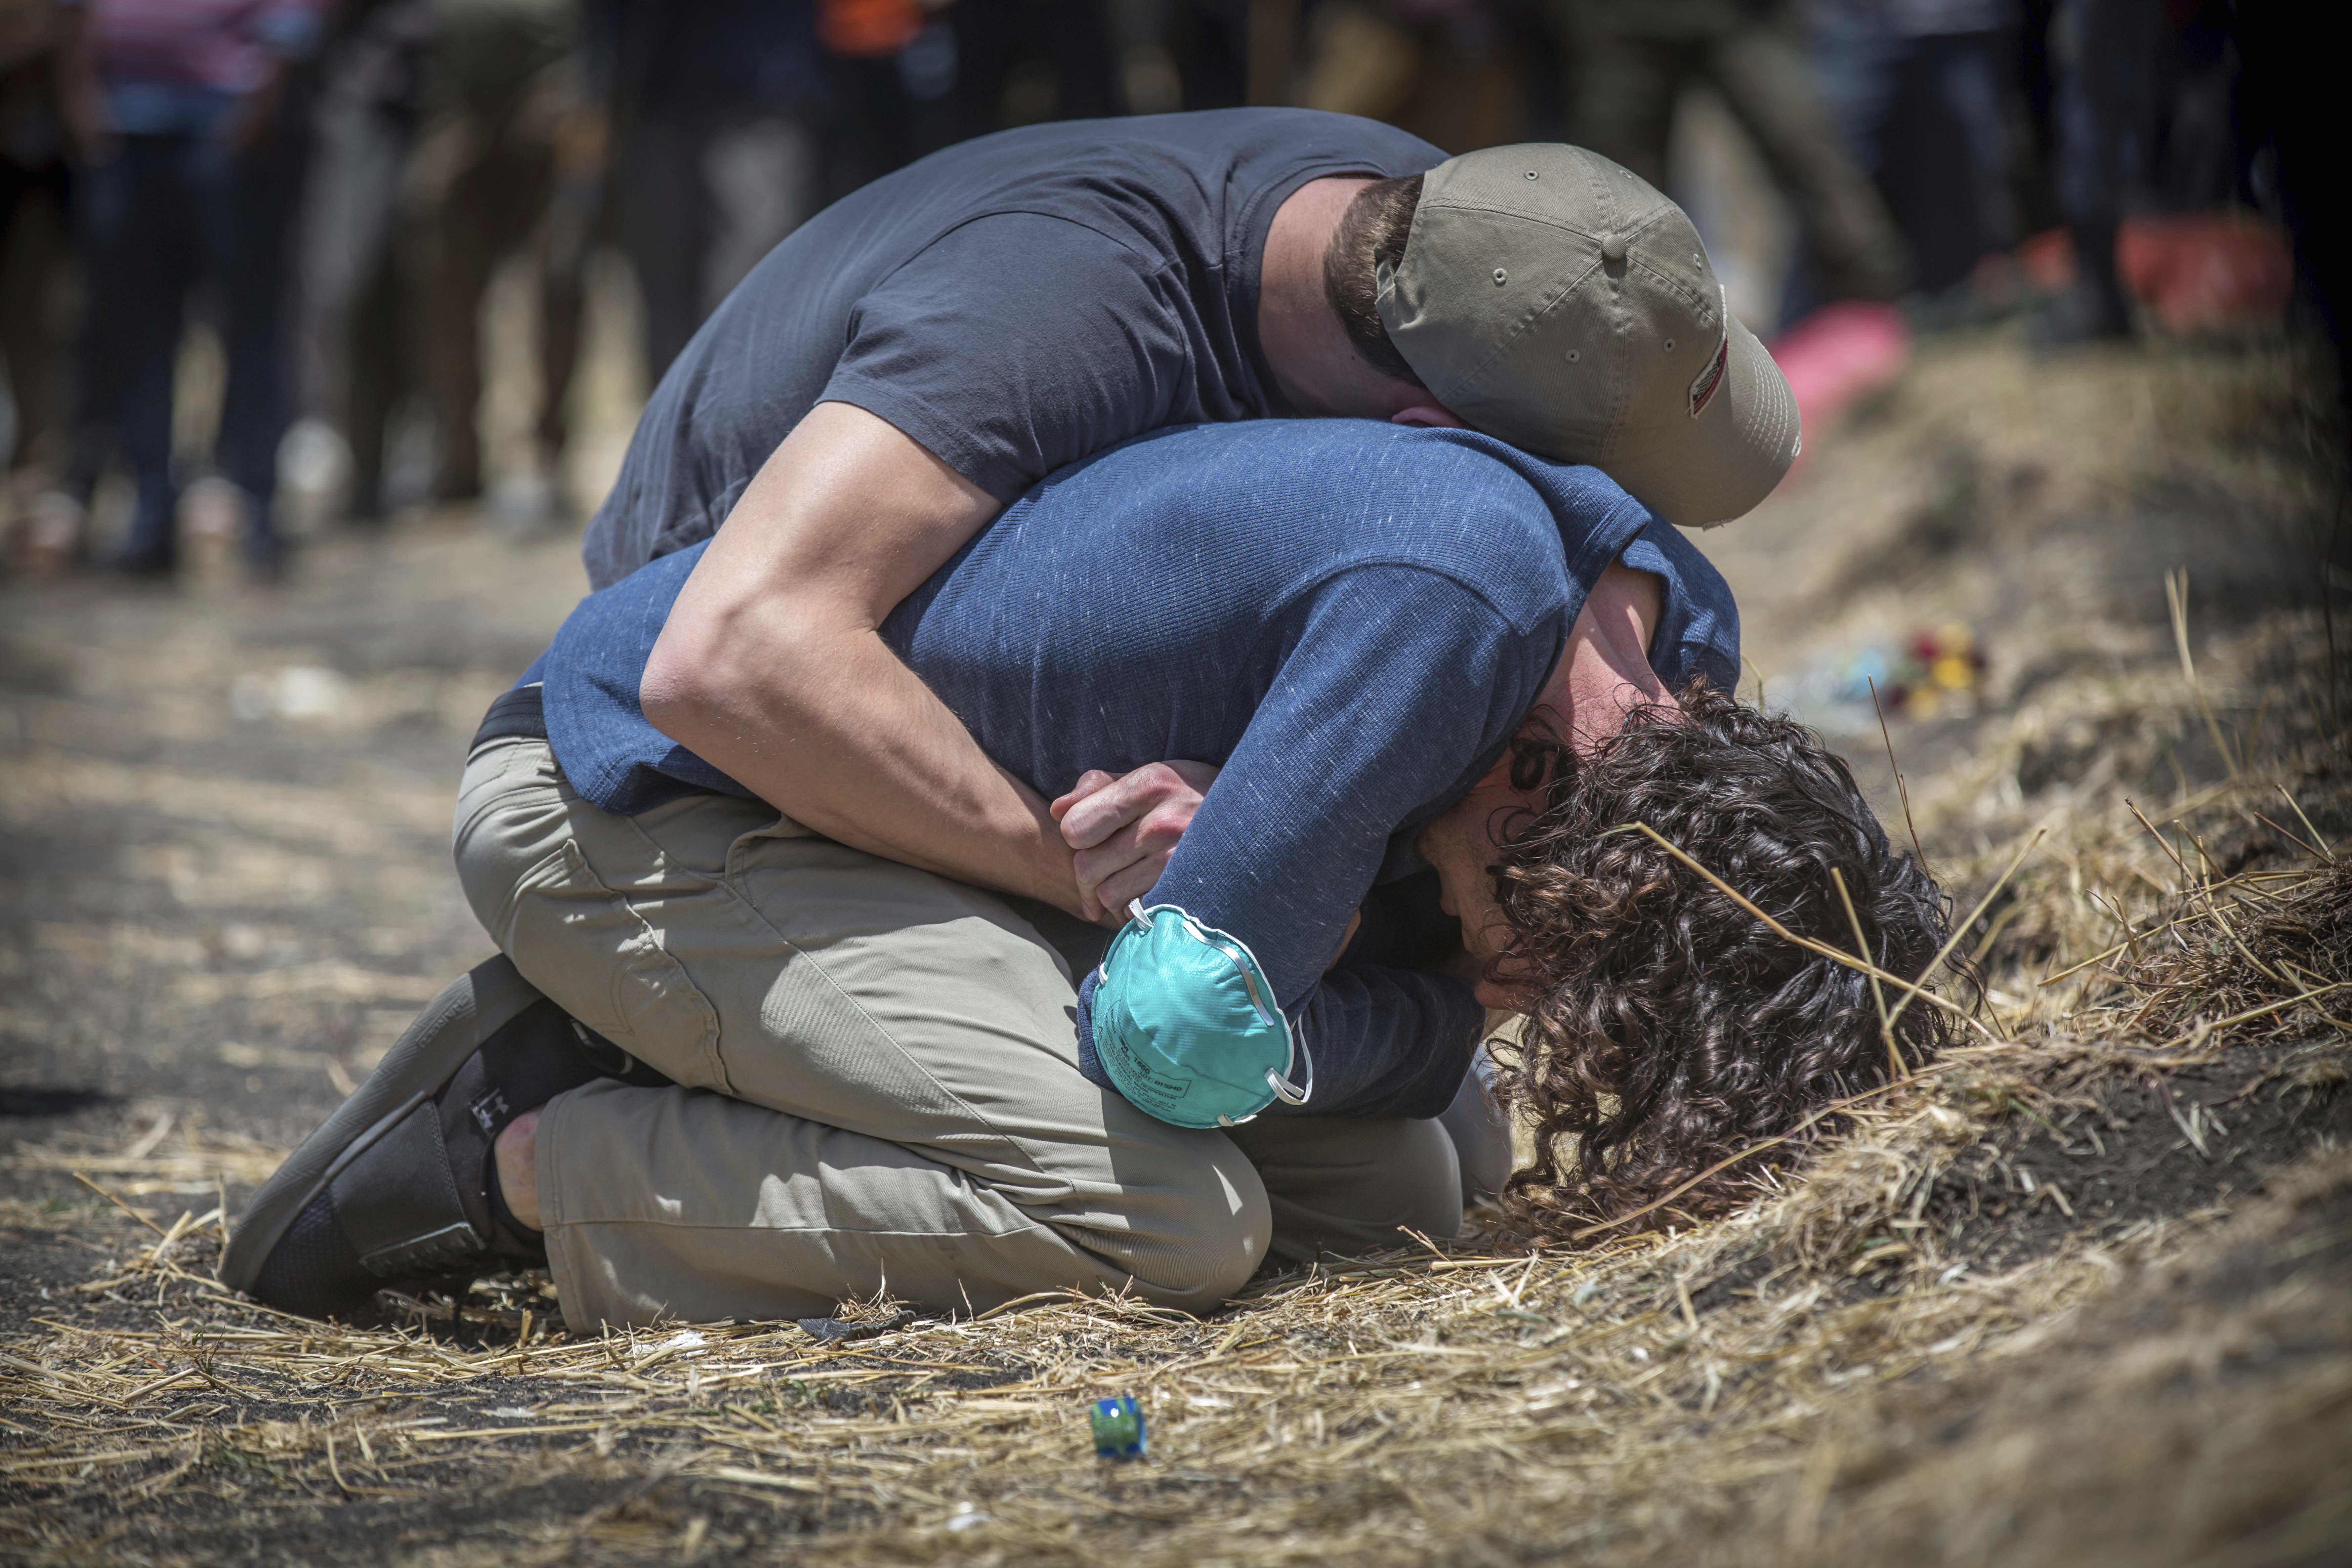 Relatives react at the crash scene of Ethiopian Airlines flight ET 302 near Bishoftu,Ethiopia, south of Addis Ababa, on